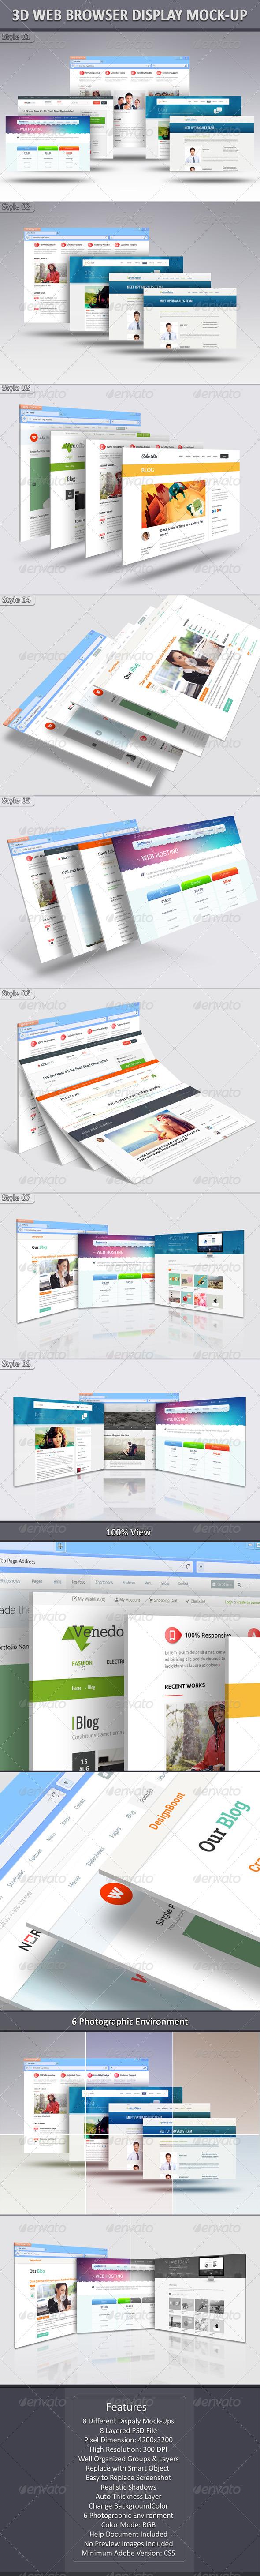 GraphicRiver 3D Web Browser Display Mock-Up 7804501